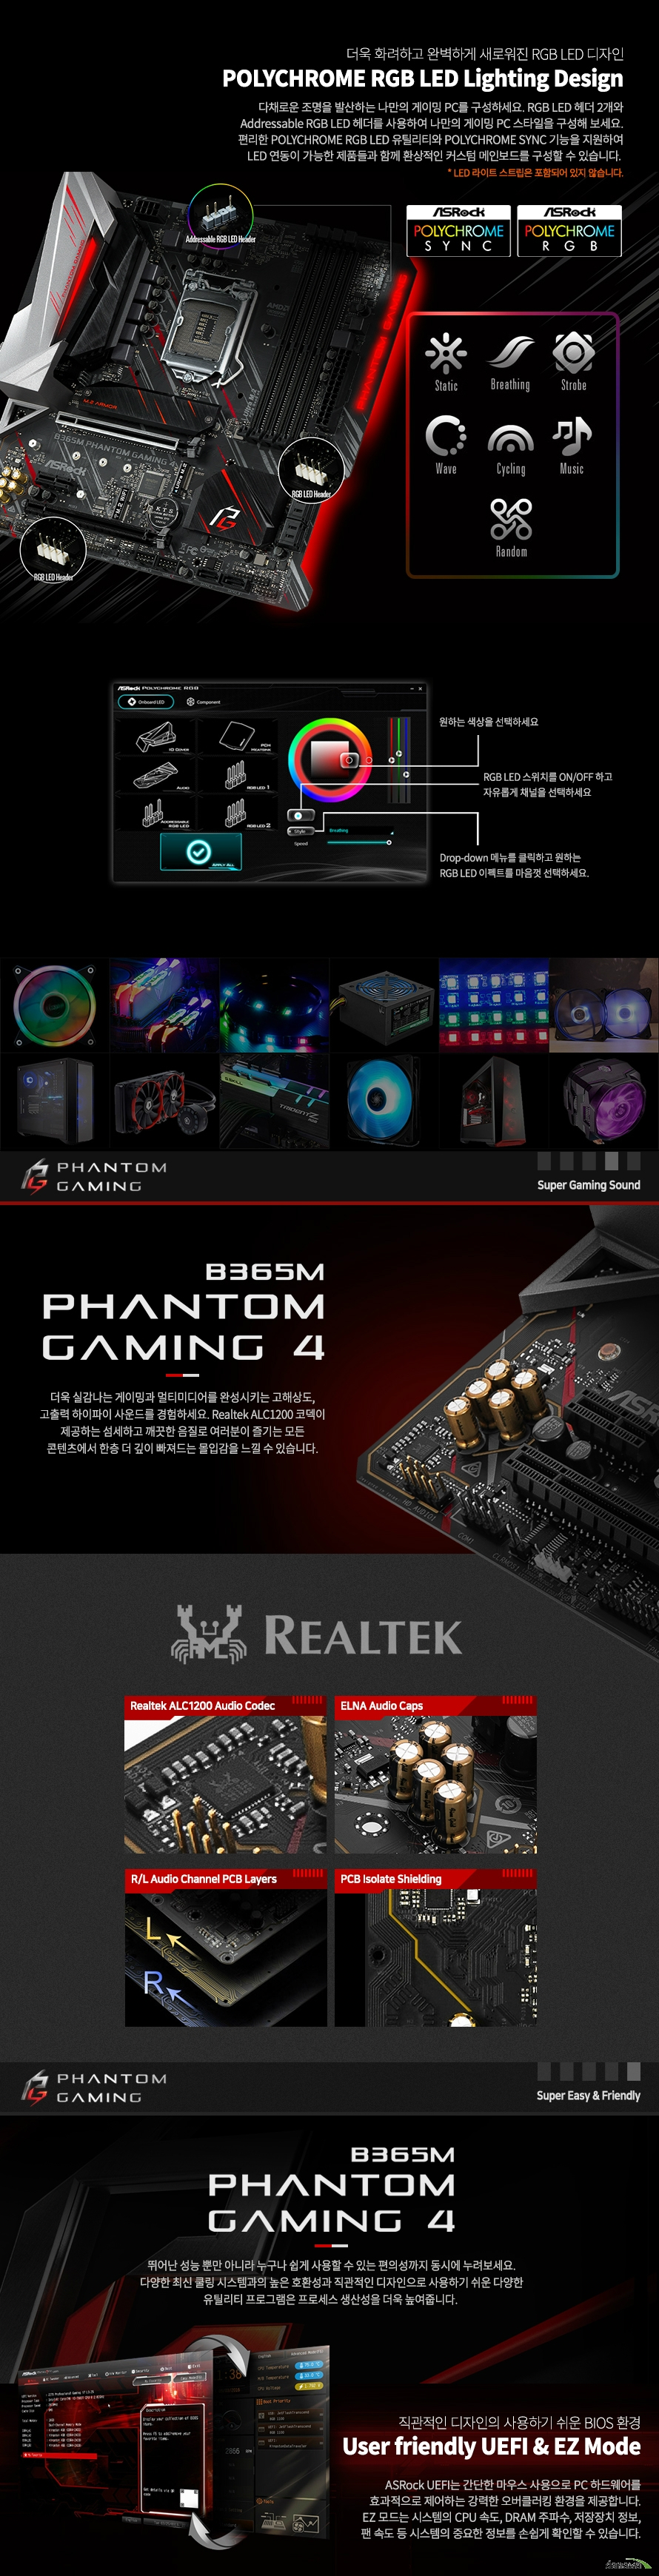 ASRock  B365M Phantom Gaming 4 에즈윈